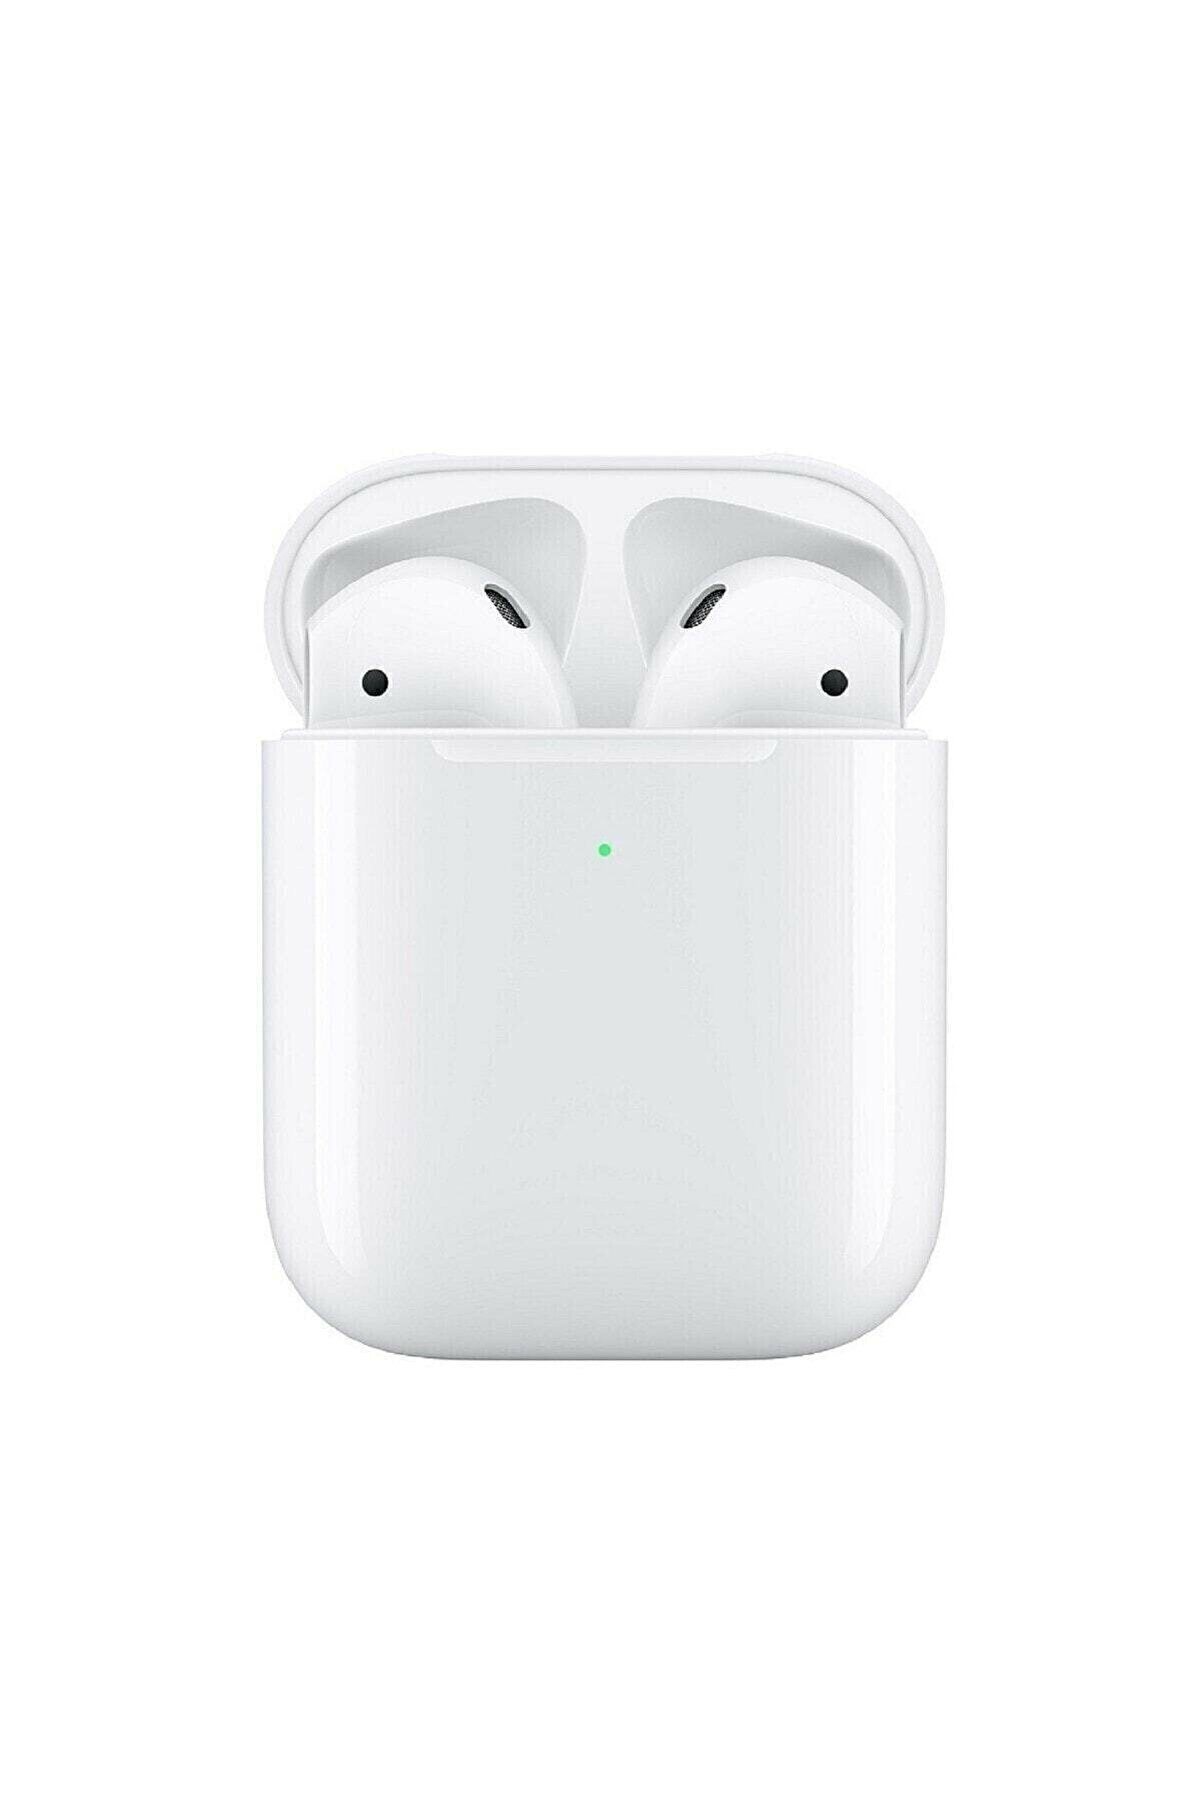 SANALİNK 2. Nesil Iphone Ve Android Uyumlu Bluetooth Kulaklık Dokunmatik Panel A Kalite-plus